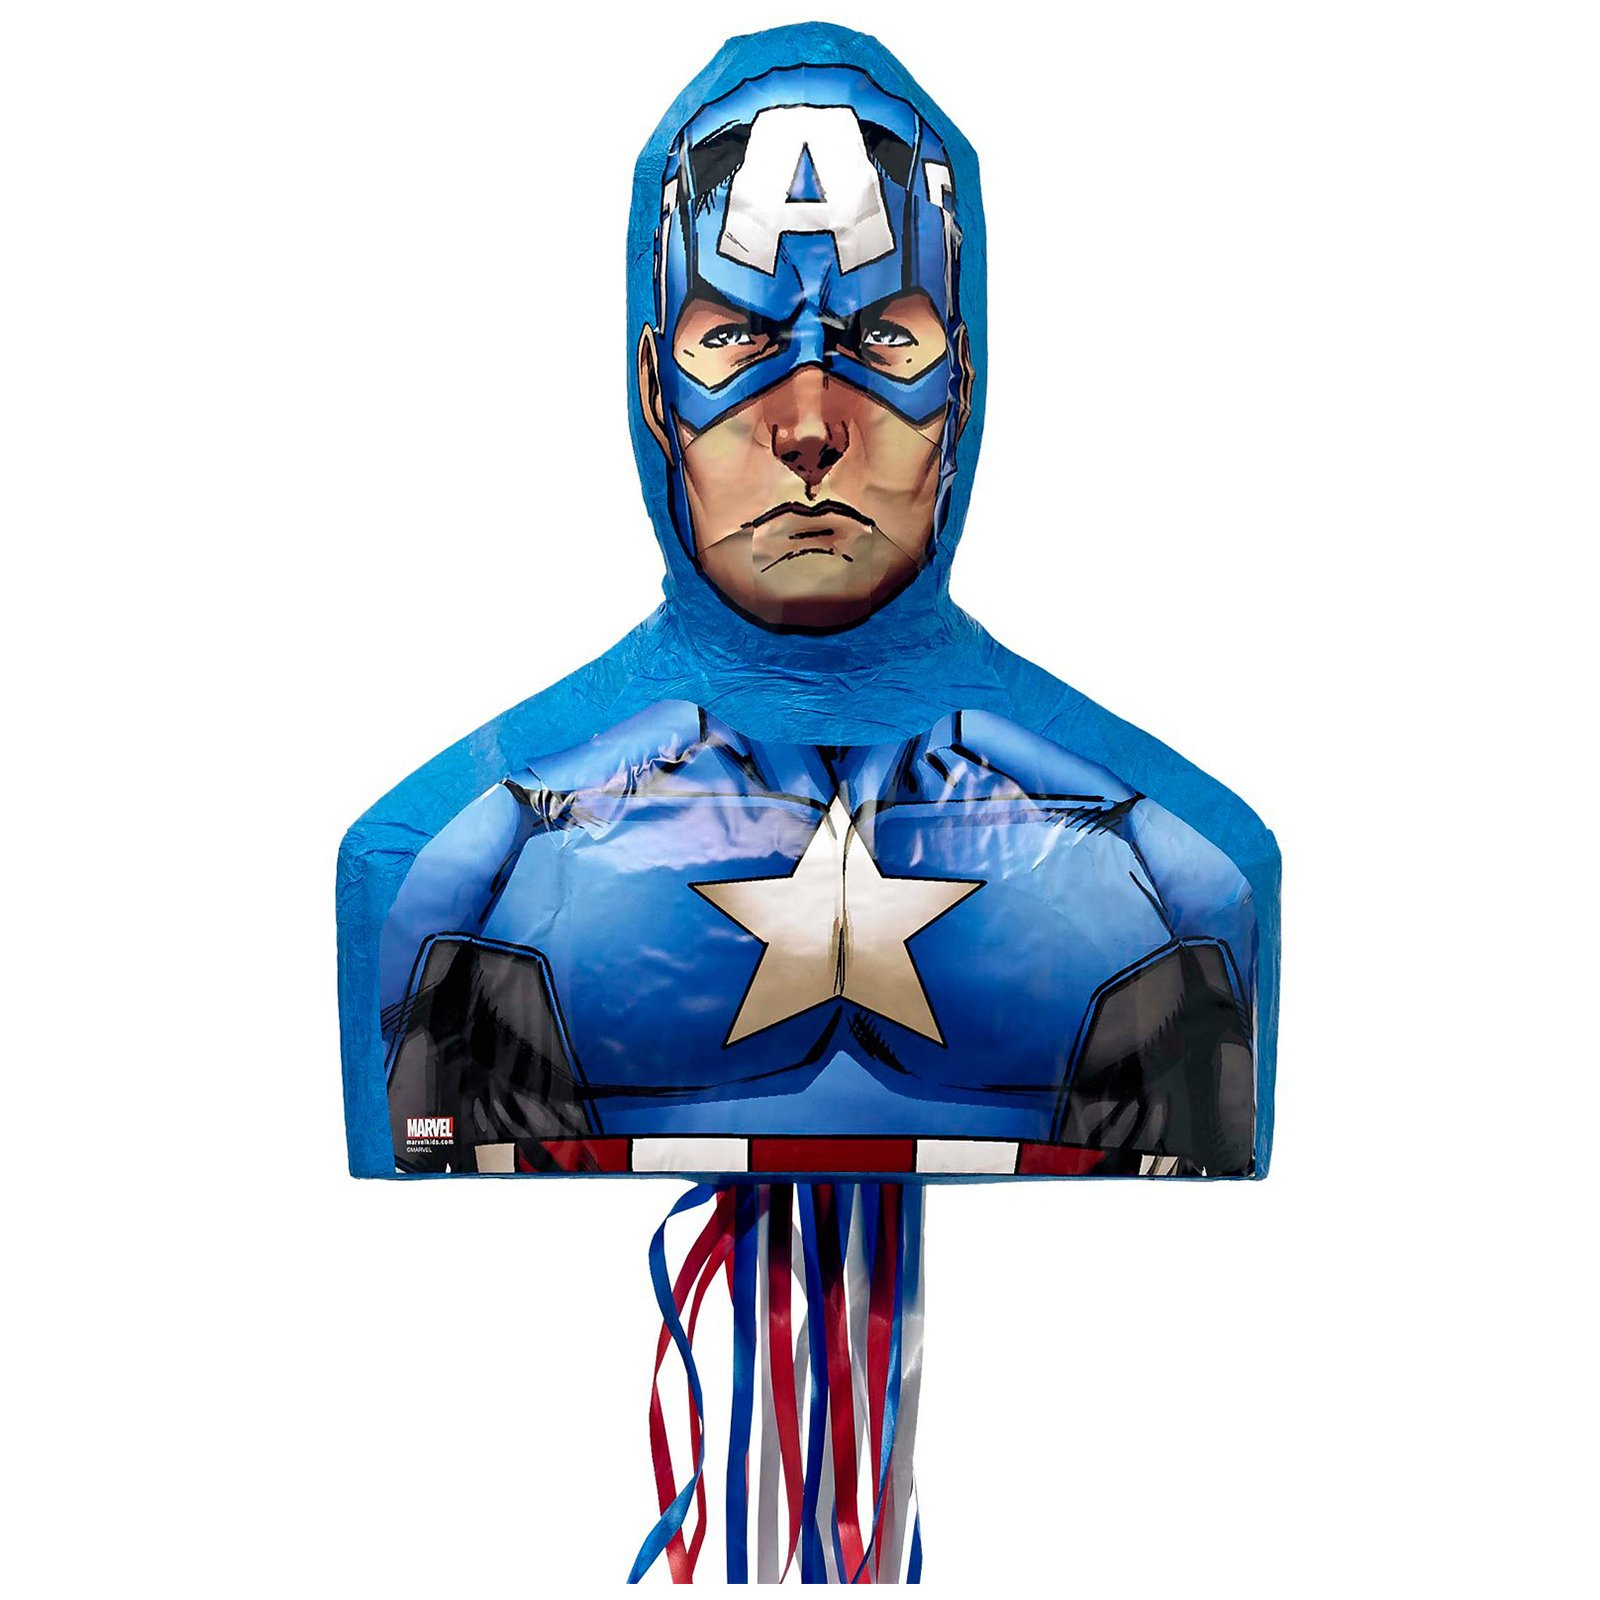 Ya Otta Pinata Captain America 3D Pull-String Pinata by Yaotta